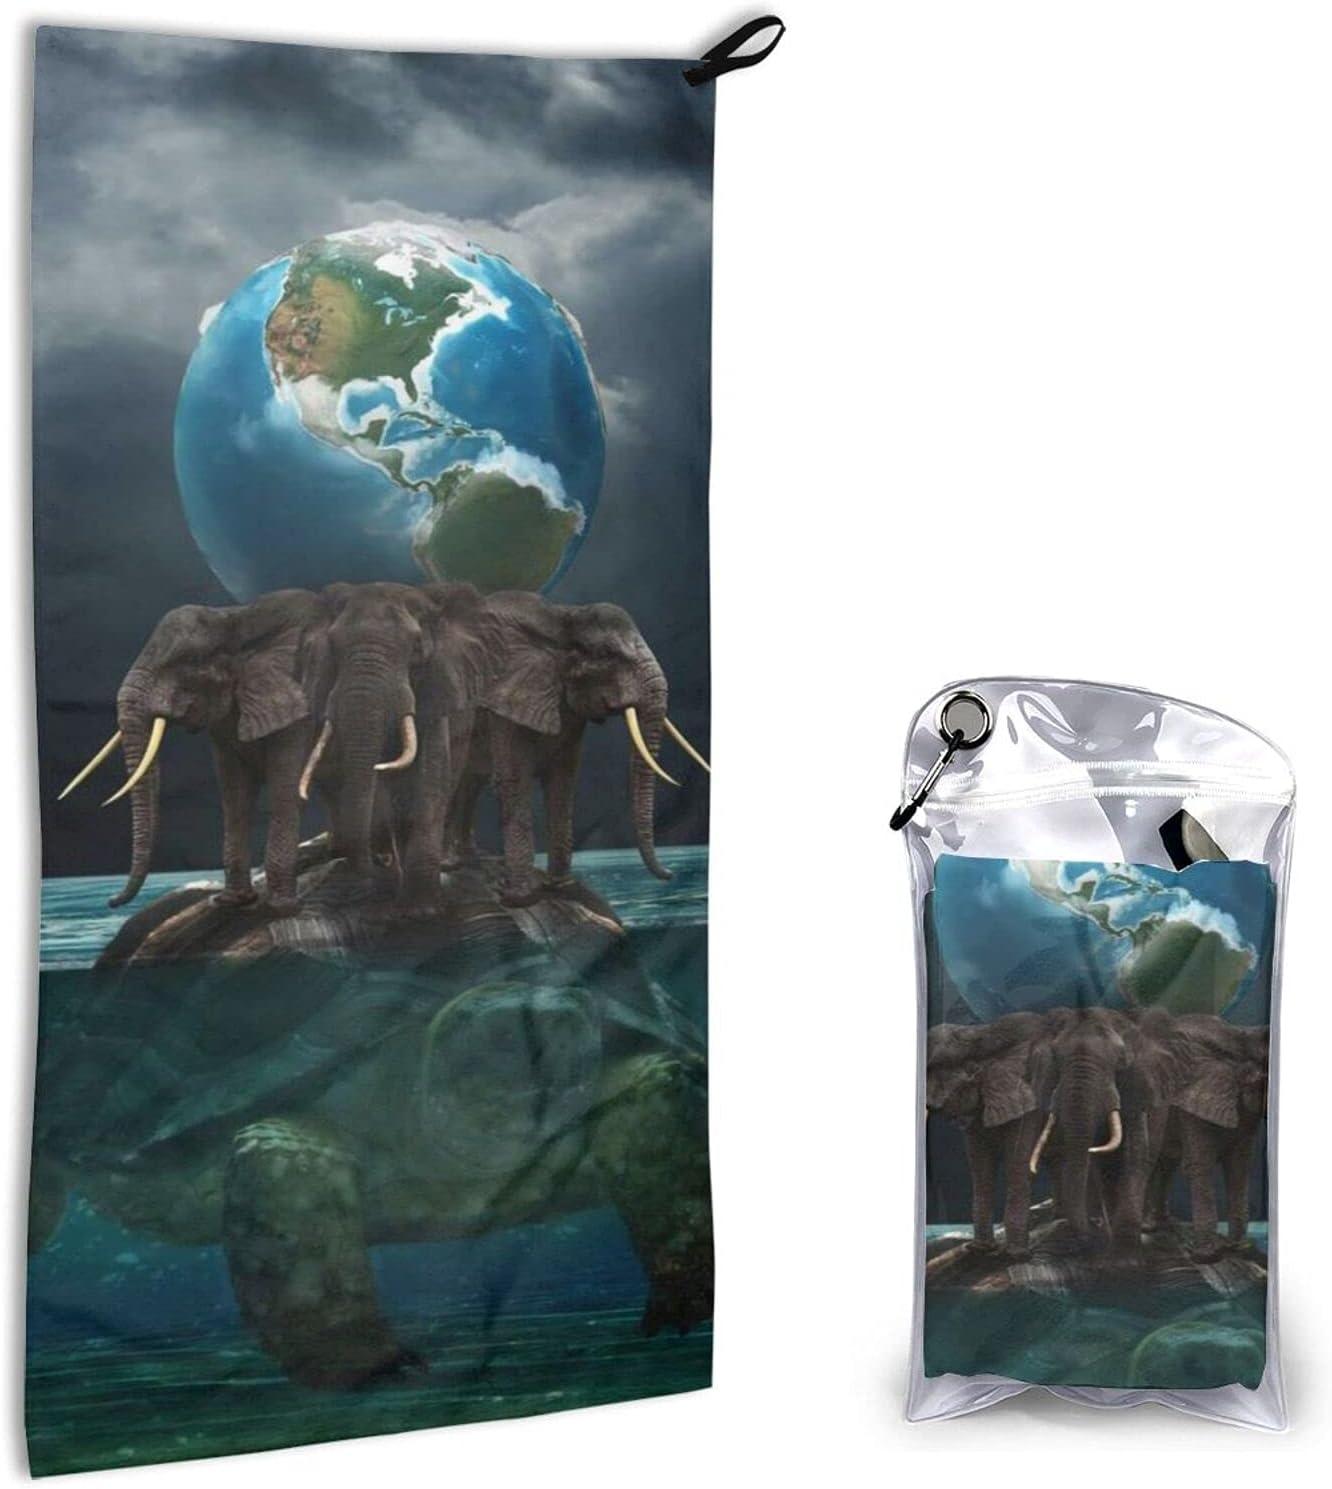 Jeezshop Quick 1 year warranty Selling Dry Microfiber Turtle Earth Super Elephant Towel